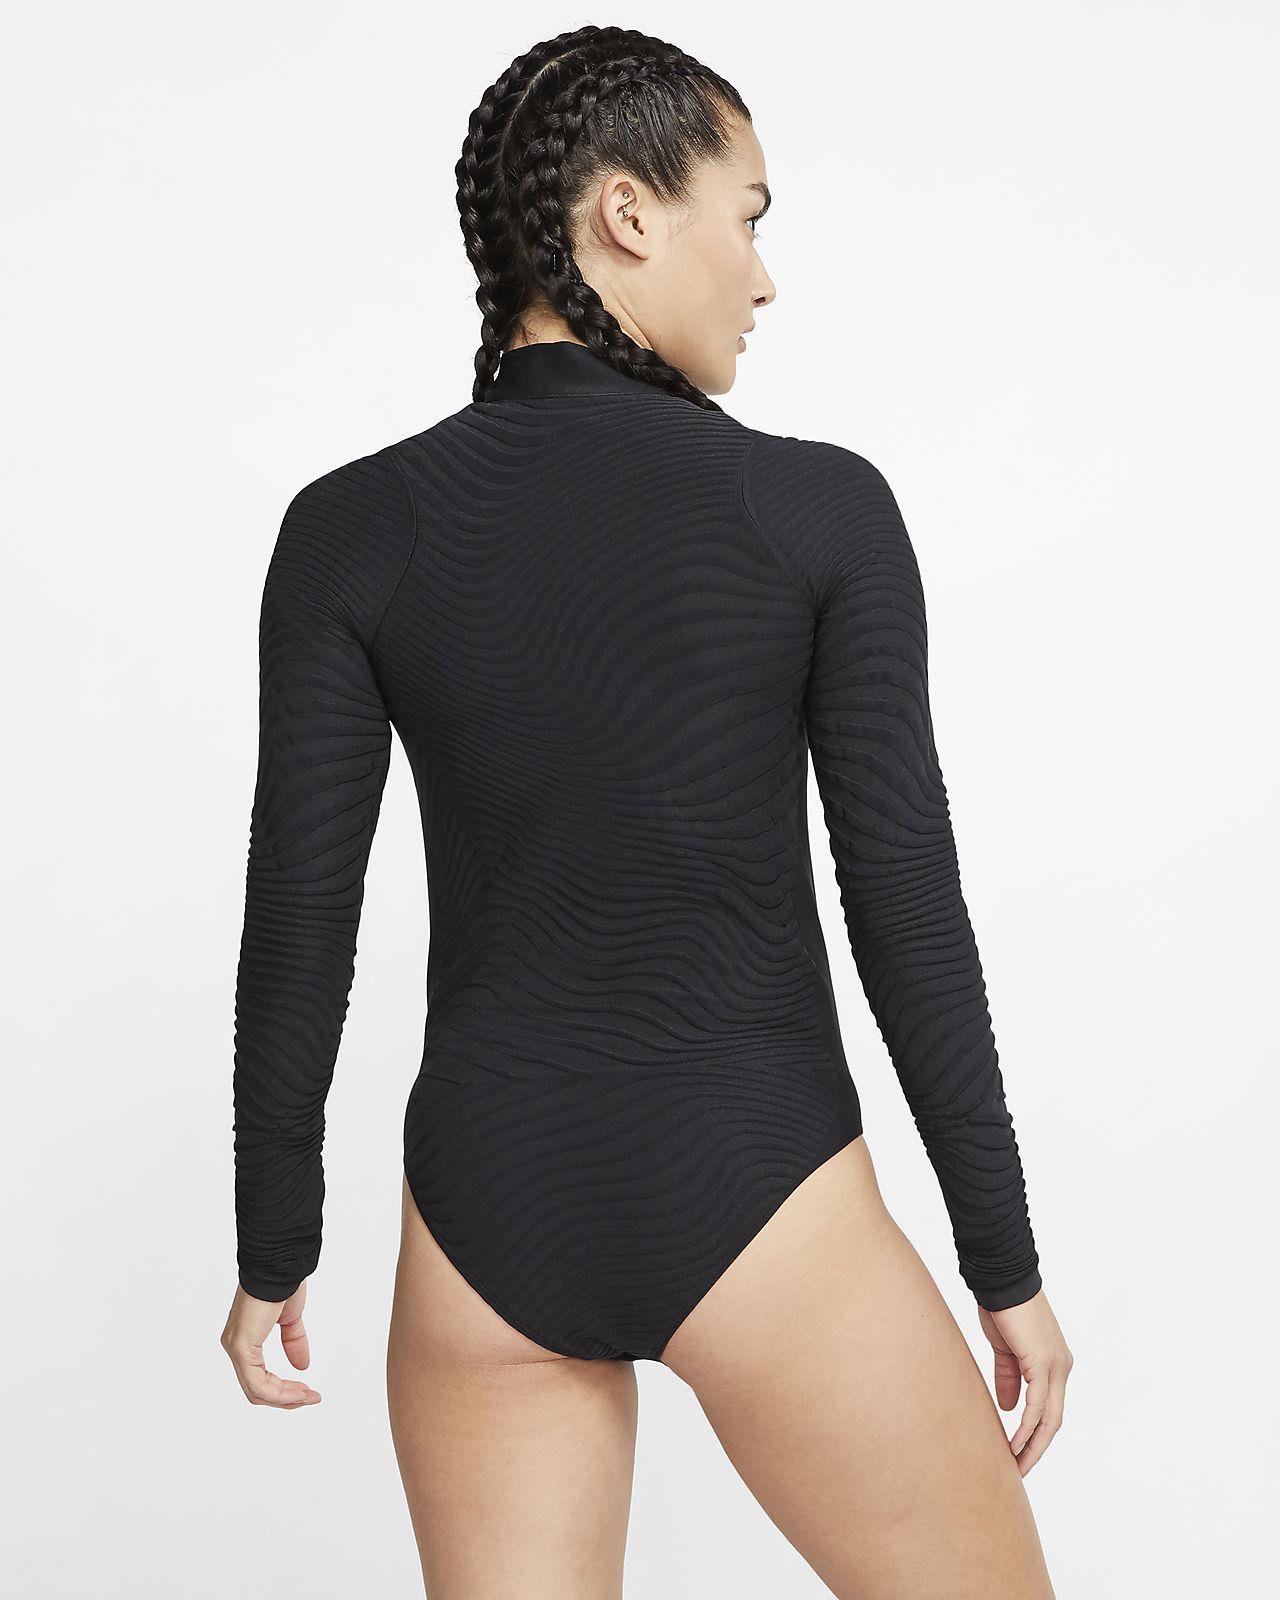 Nike City Ready Women's Seamless Long Sleeve Training Bodysuit